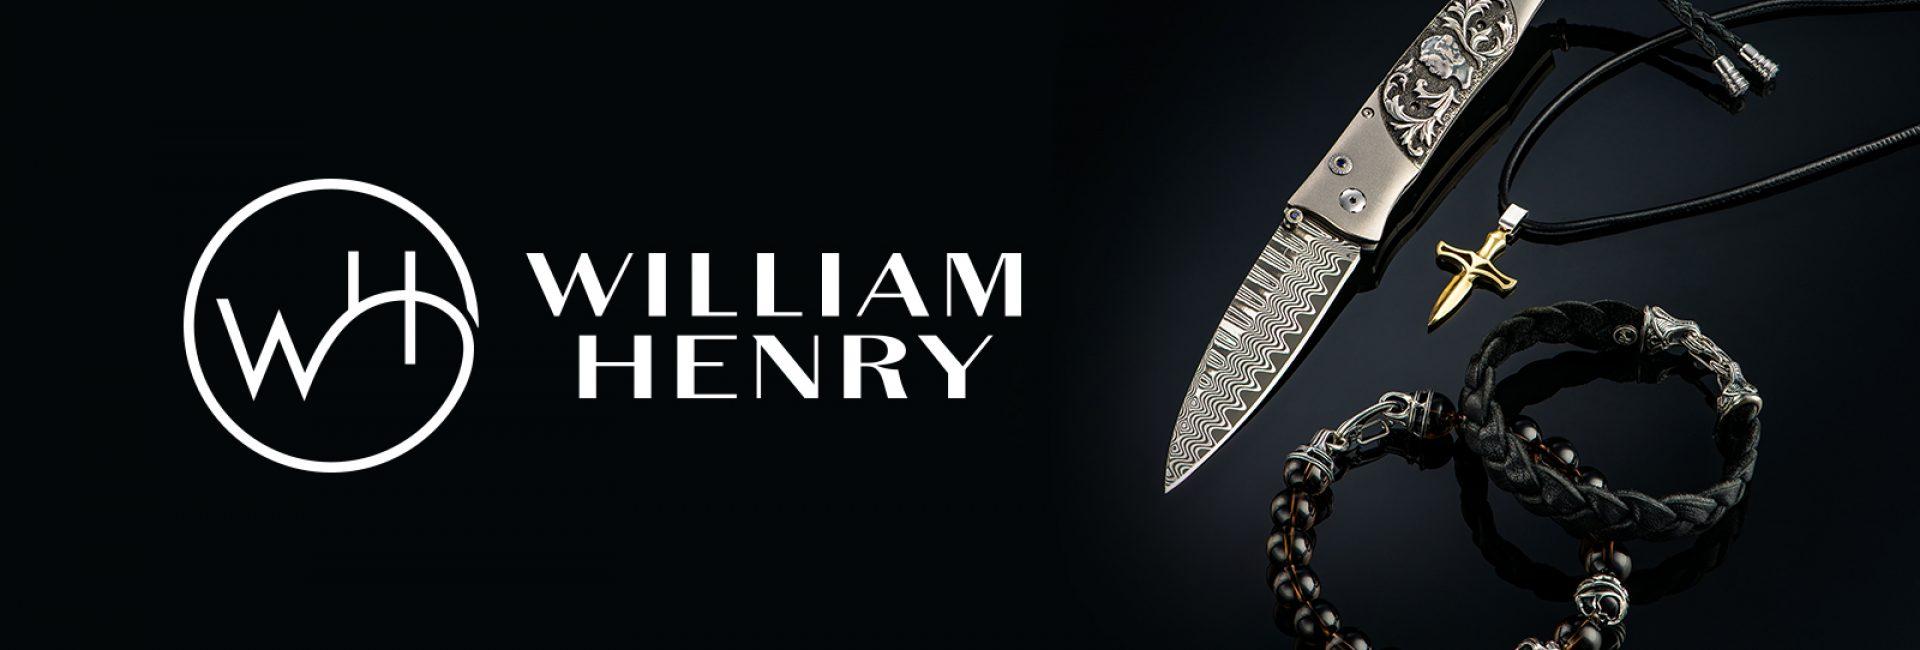 header-william-henry